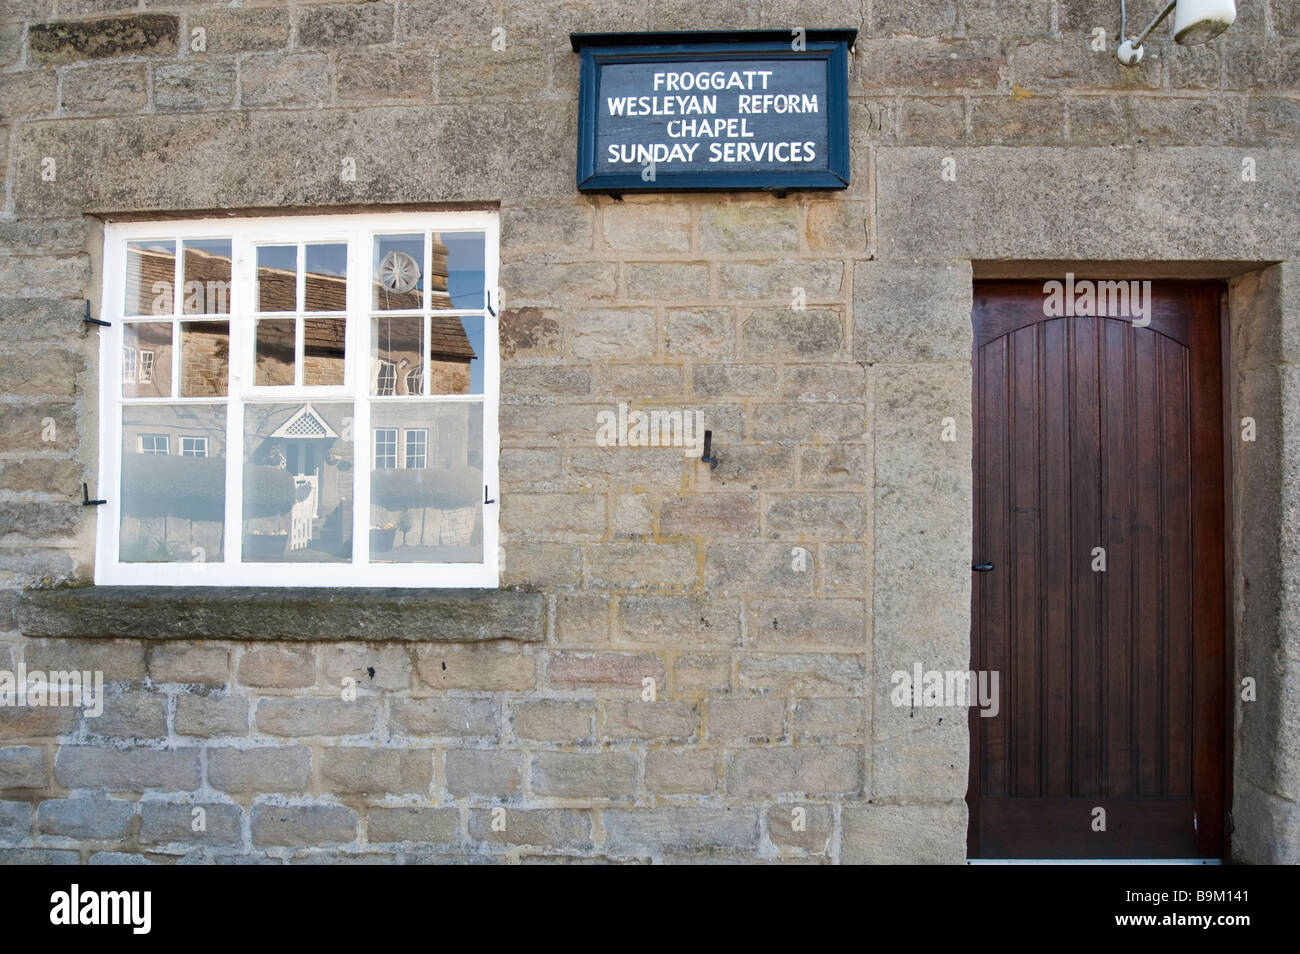 Froggatt Wesleyan Reform Chapel, Derbyshire, England,'Great Britain' - Stock Image